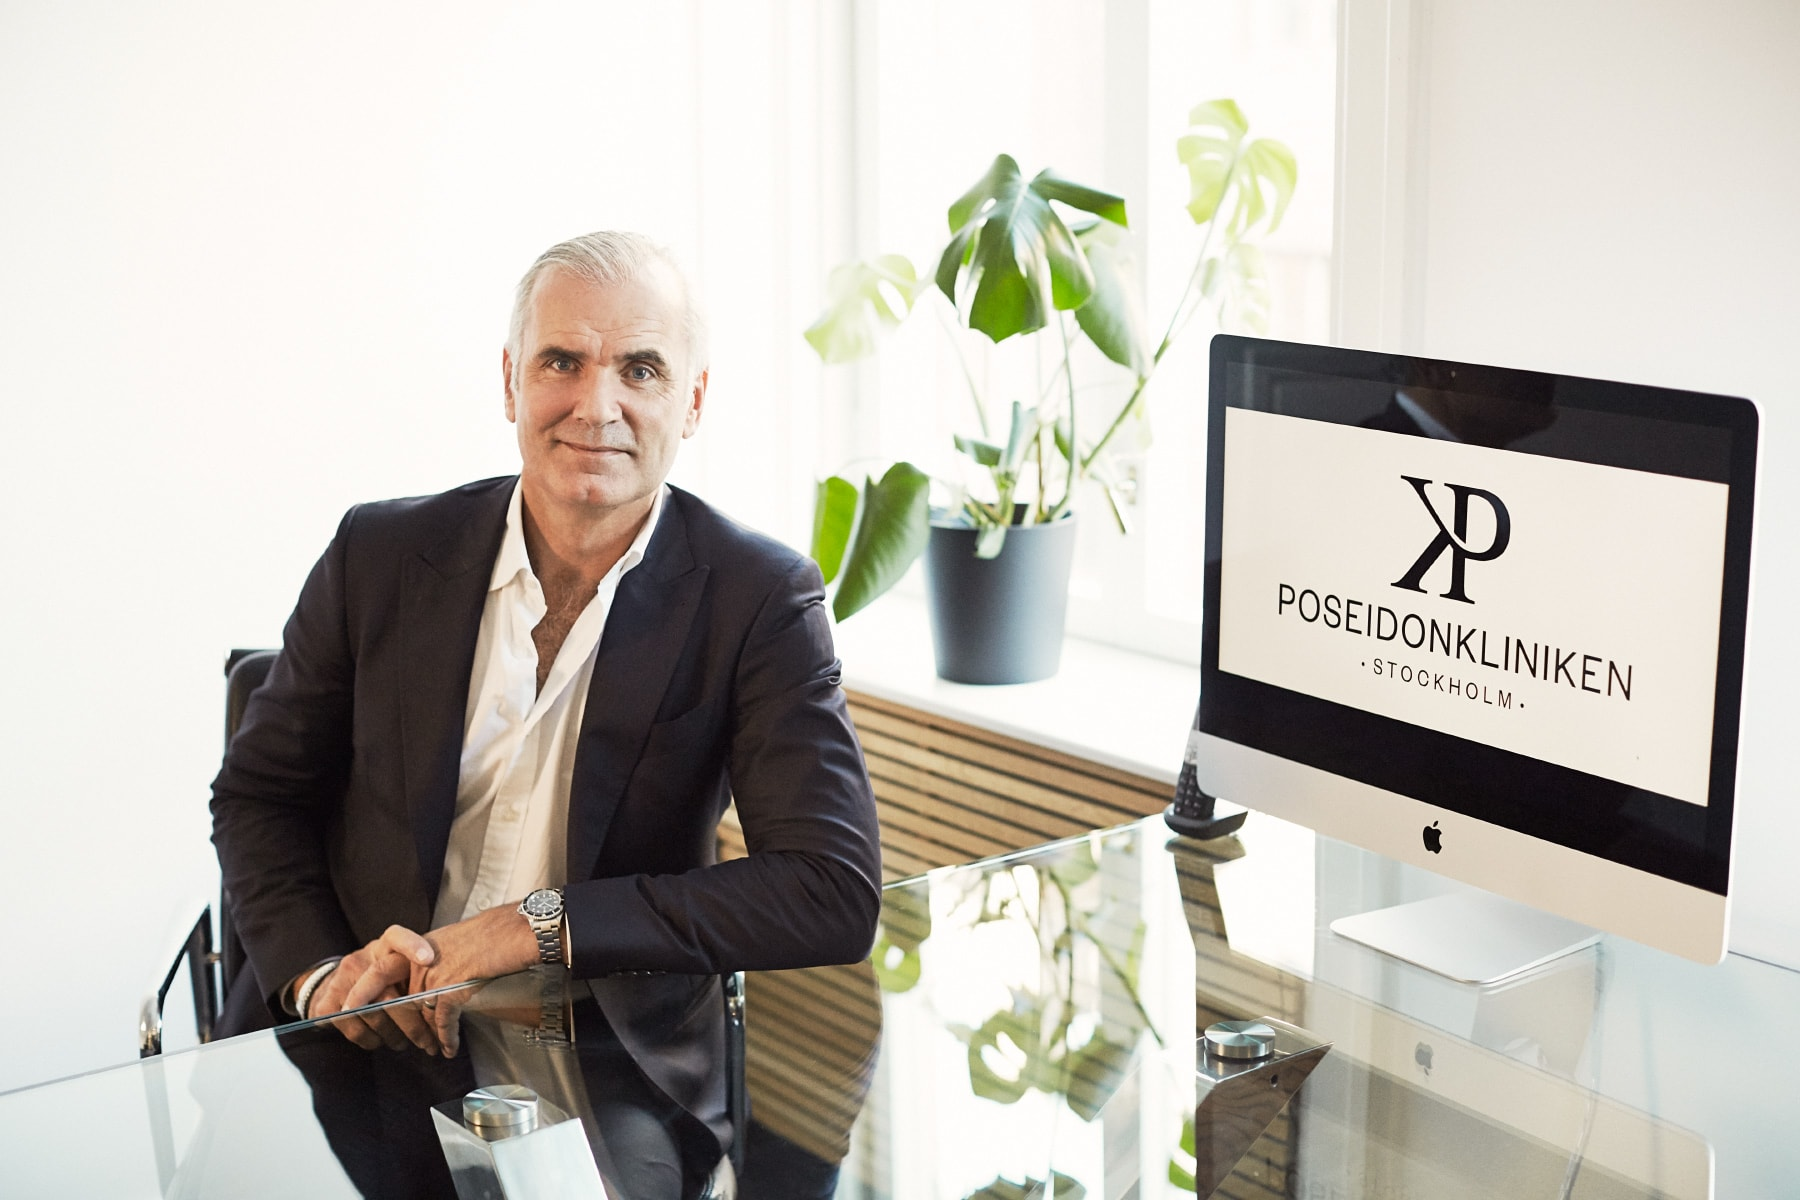 Gustaf Bodin - Hårtransplantation | Poseidonkliniken Stockholm